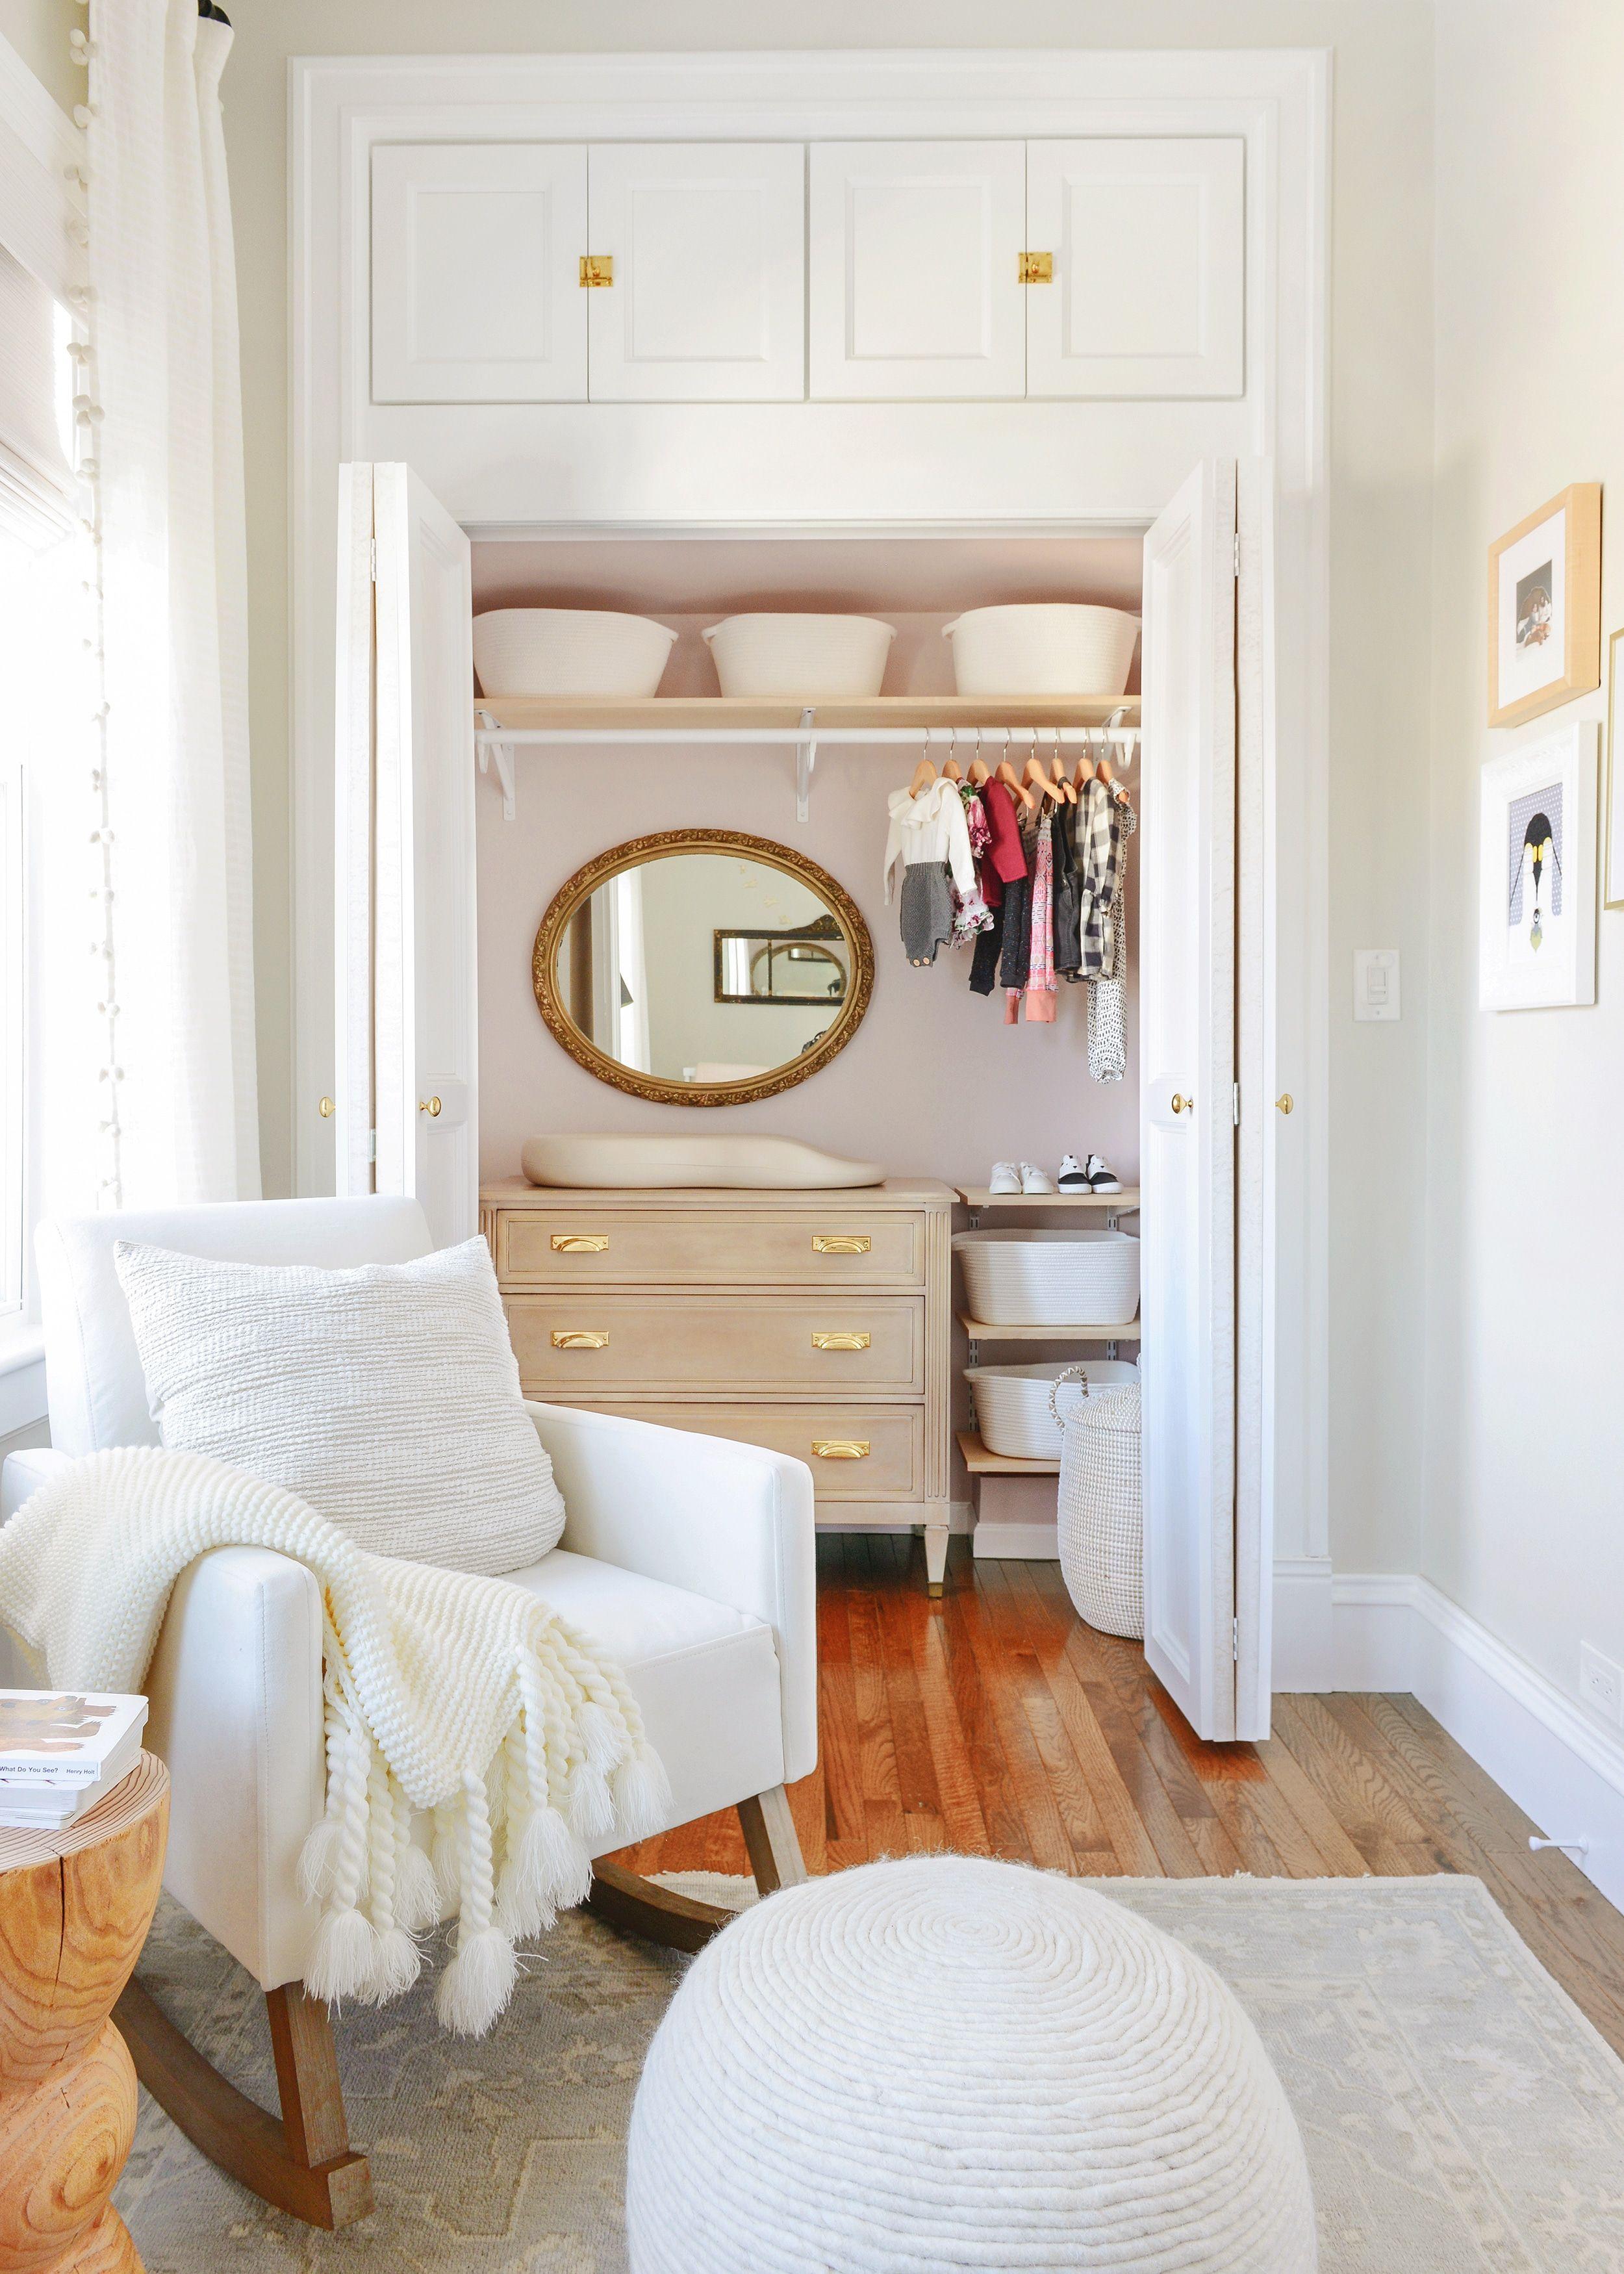 8 Nursery Organization Ideas for Your Baby's Closet